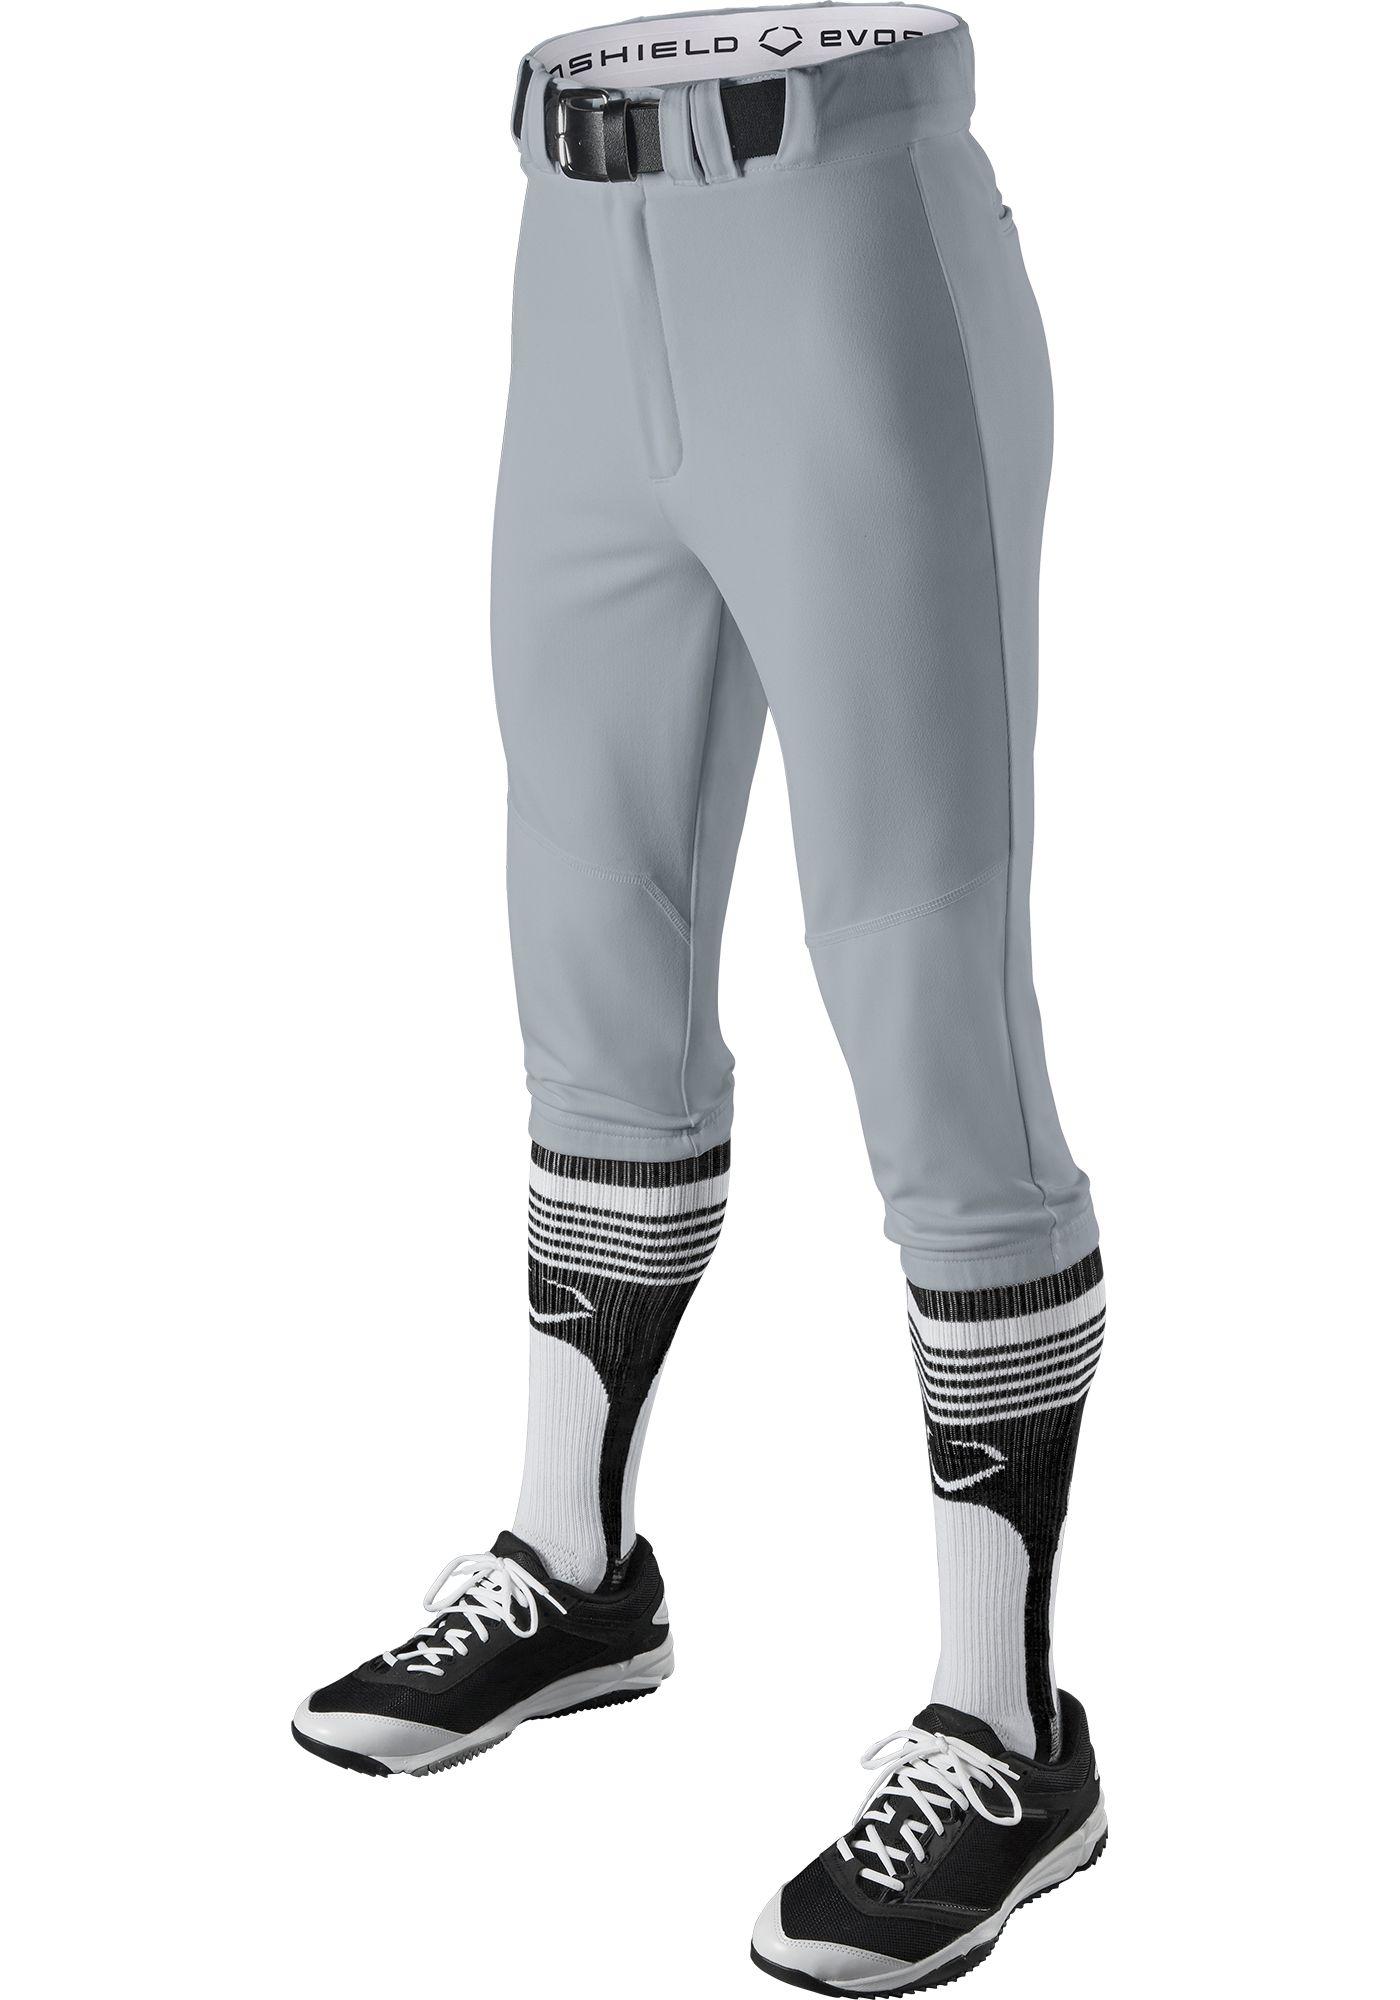 EvoShield Boys' Throwback Knicker Baseball Pants